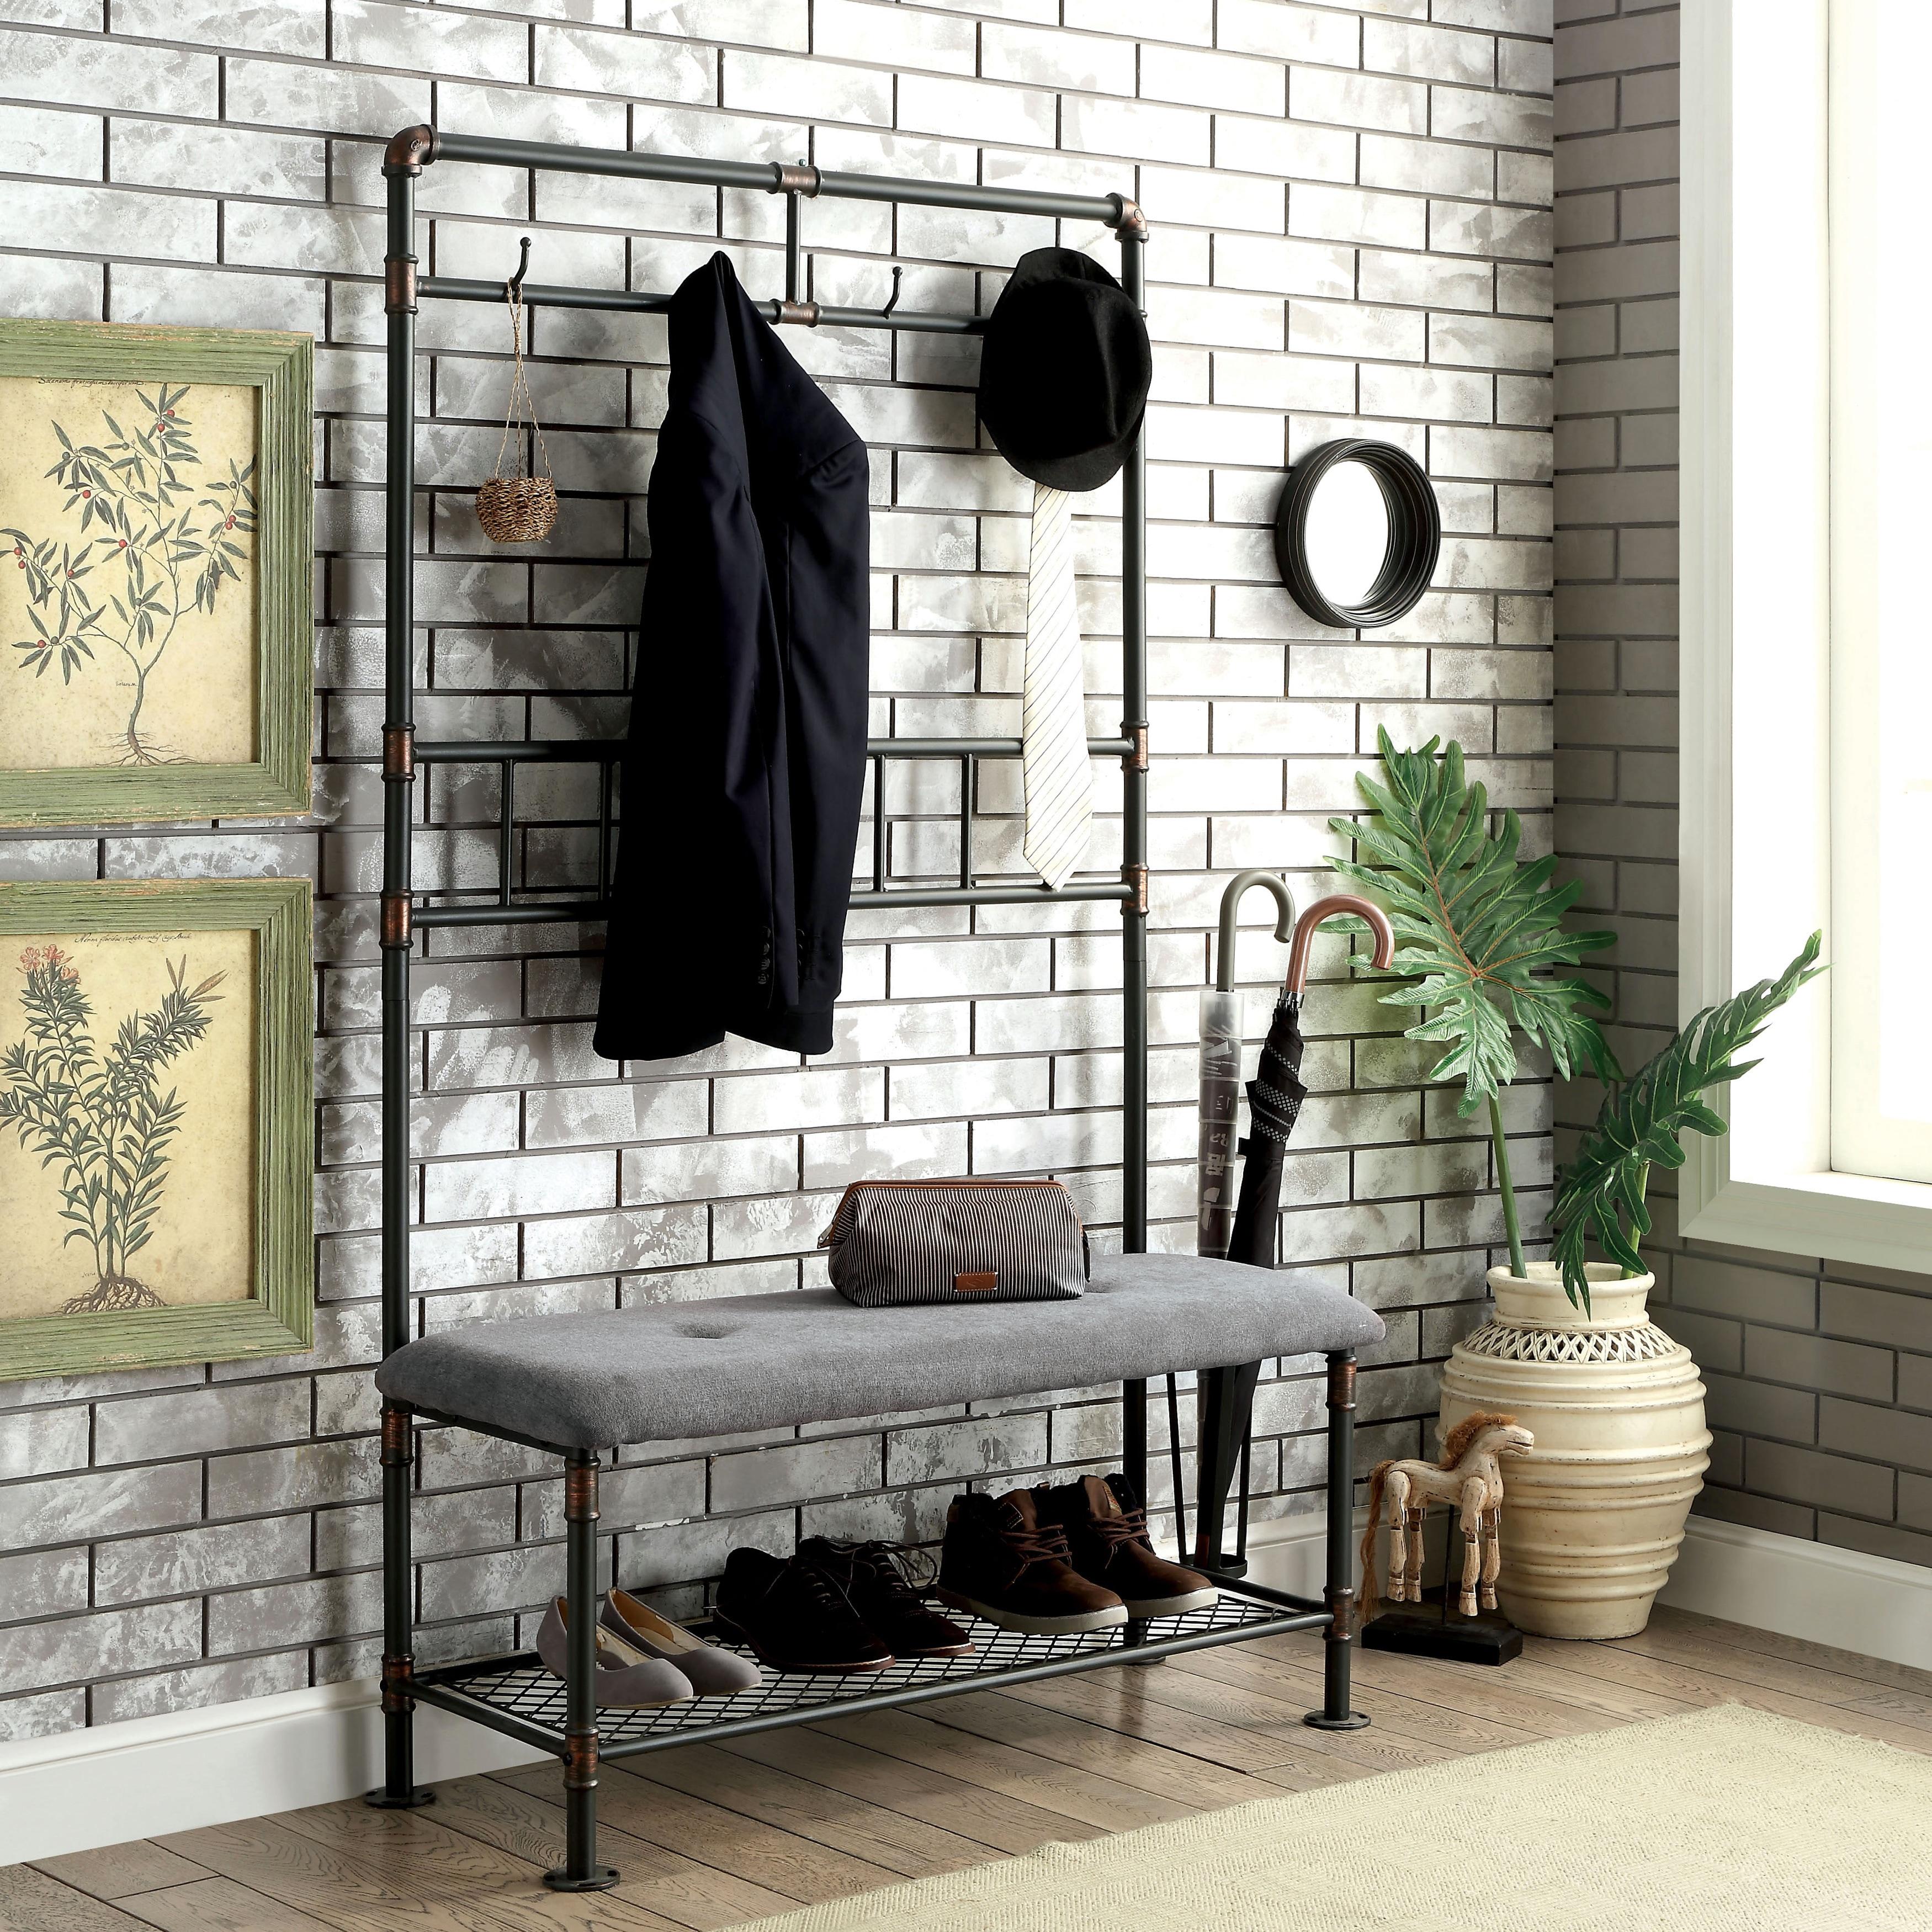 Furniture of America Revo Industrial Pipe-Inspired 45-inc...